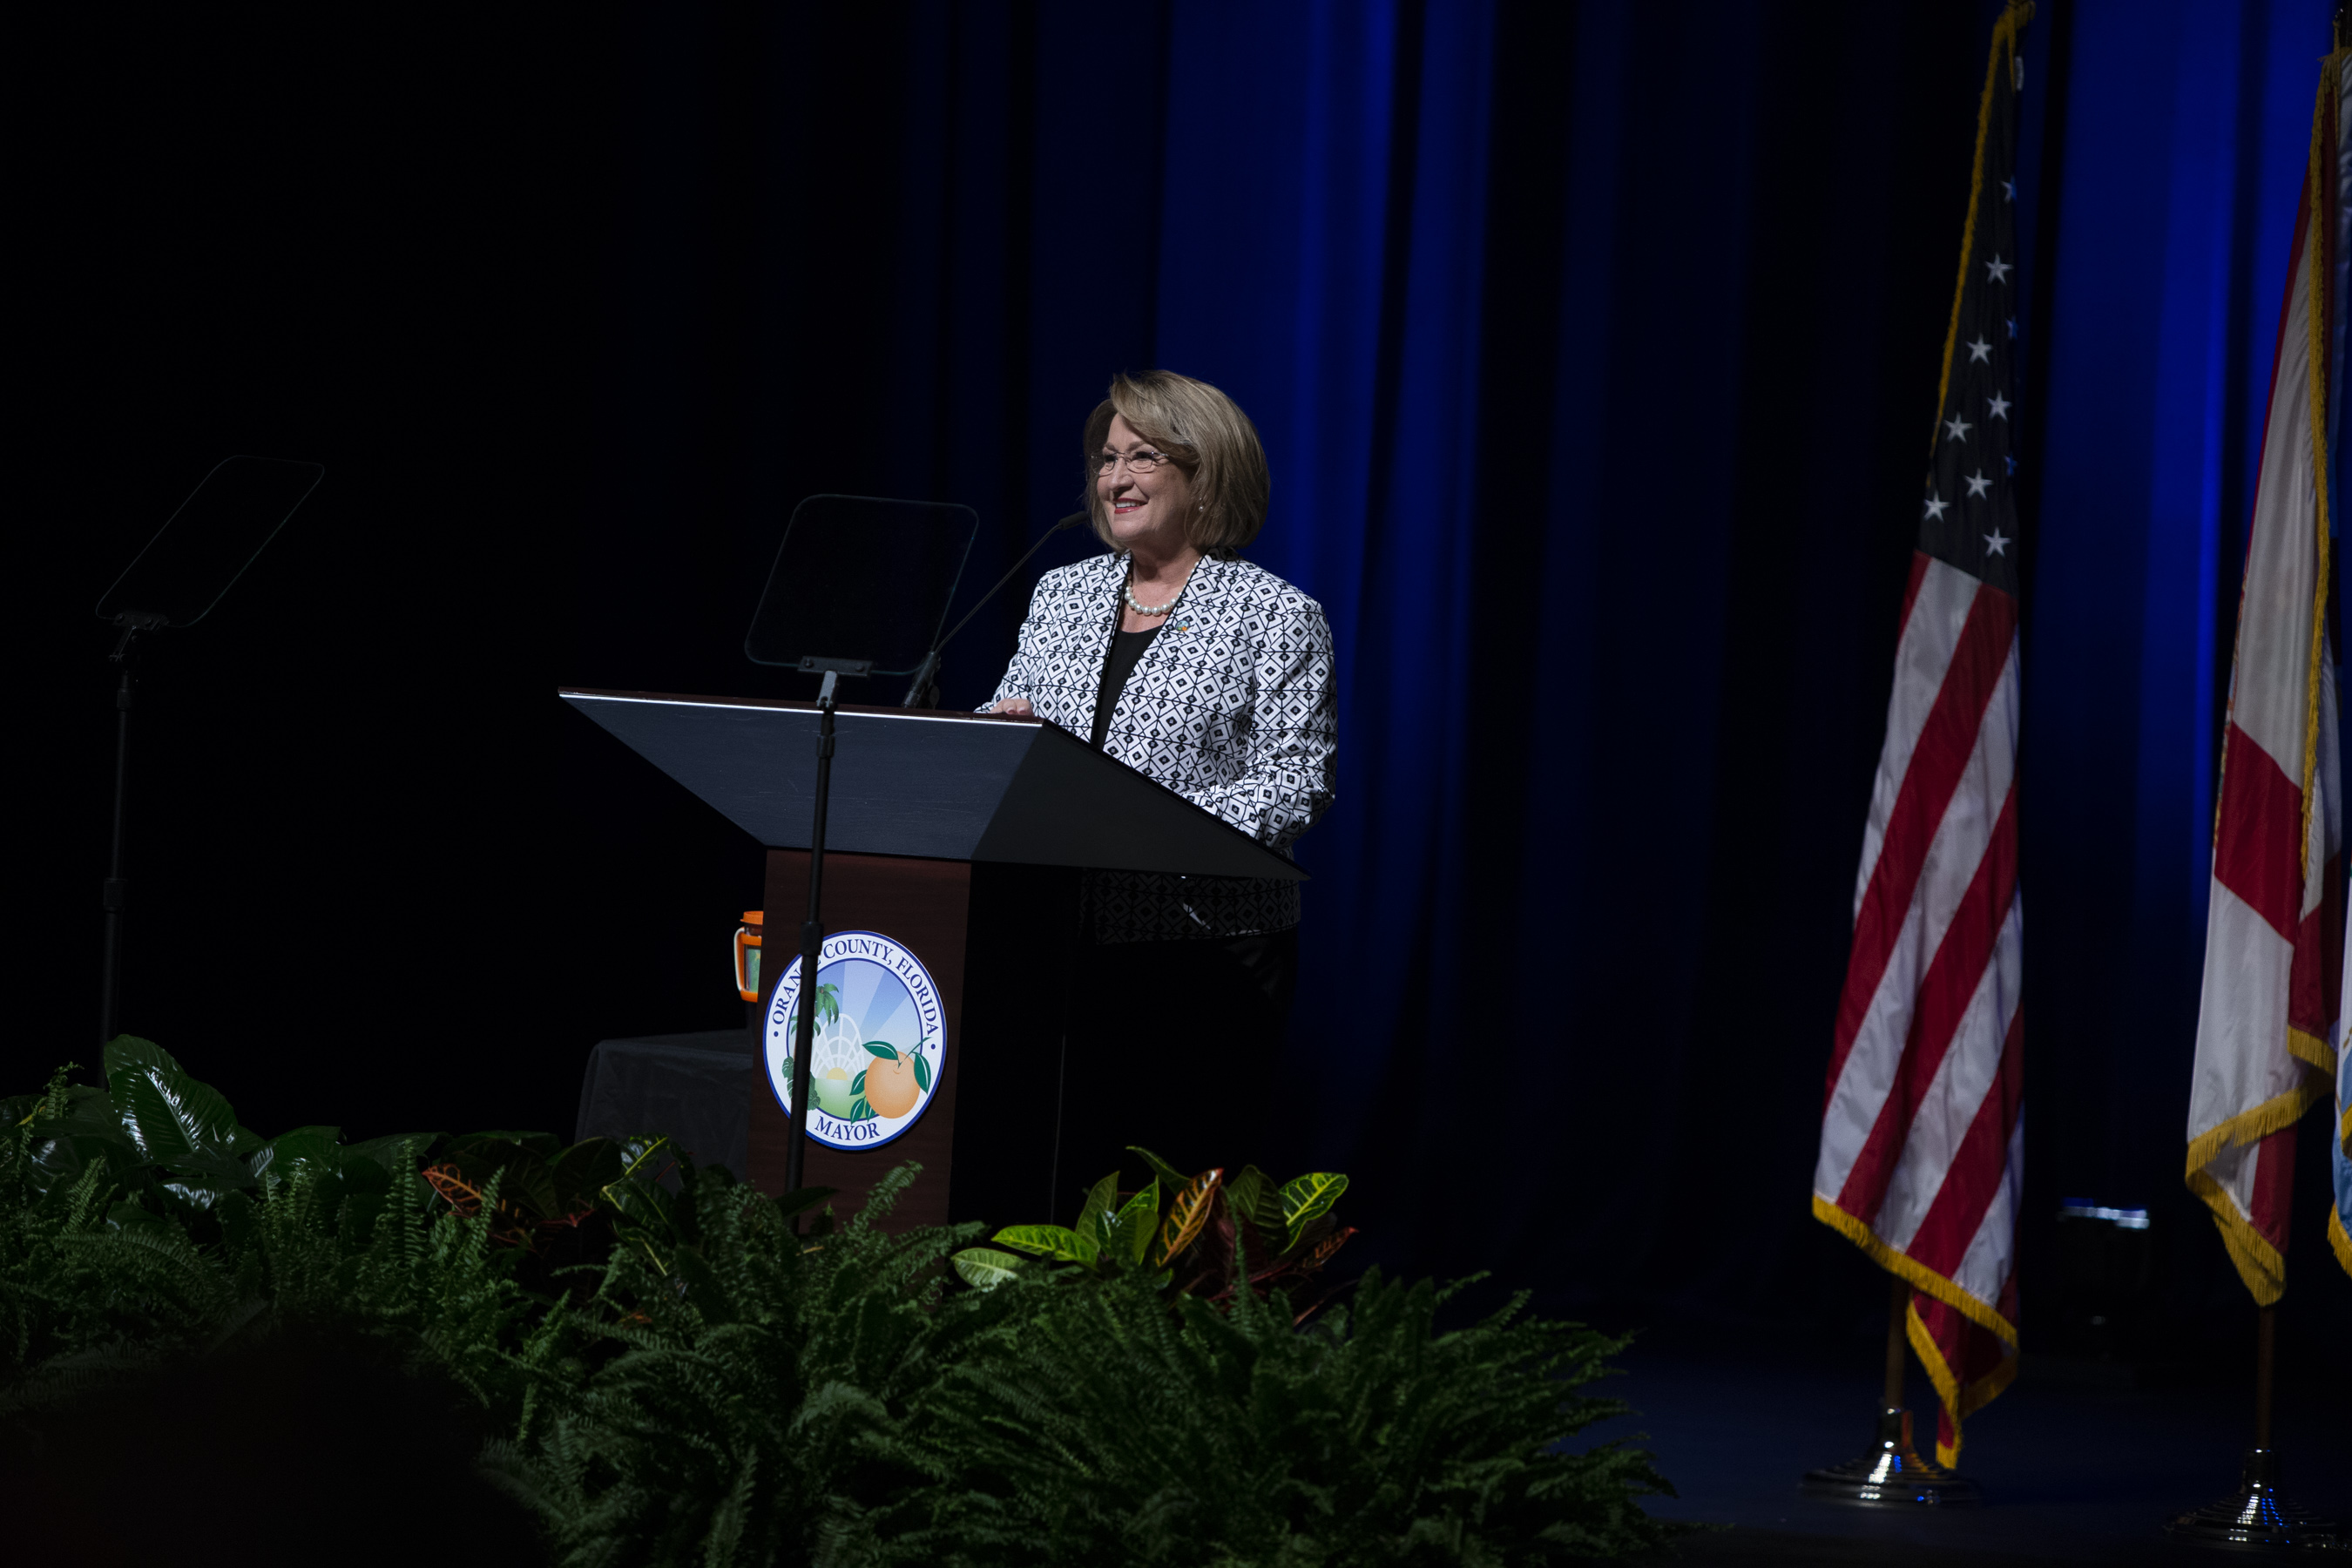 Mayor Jacobs at a podium